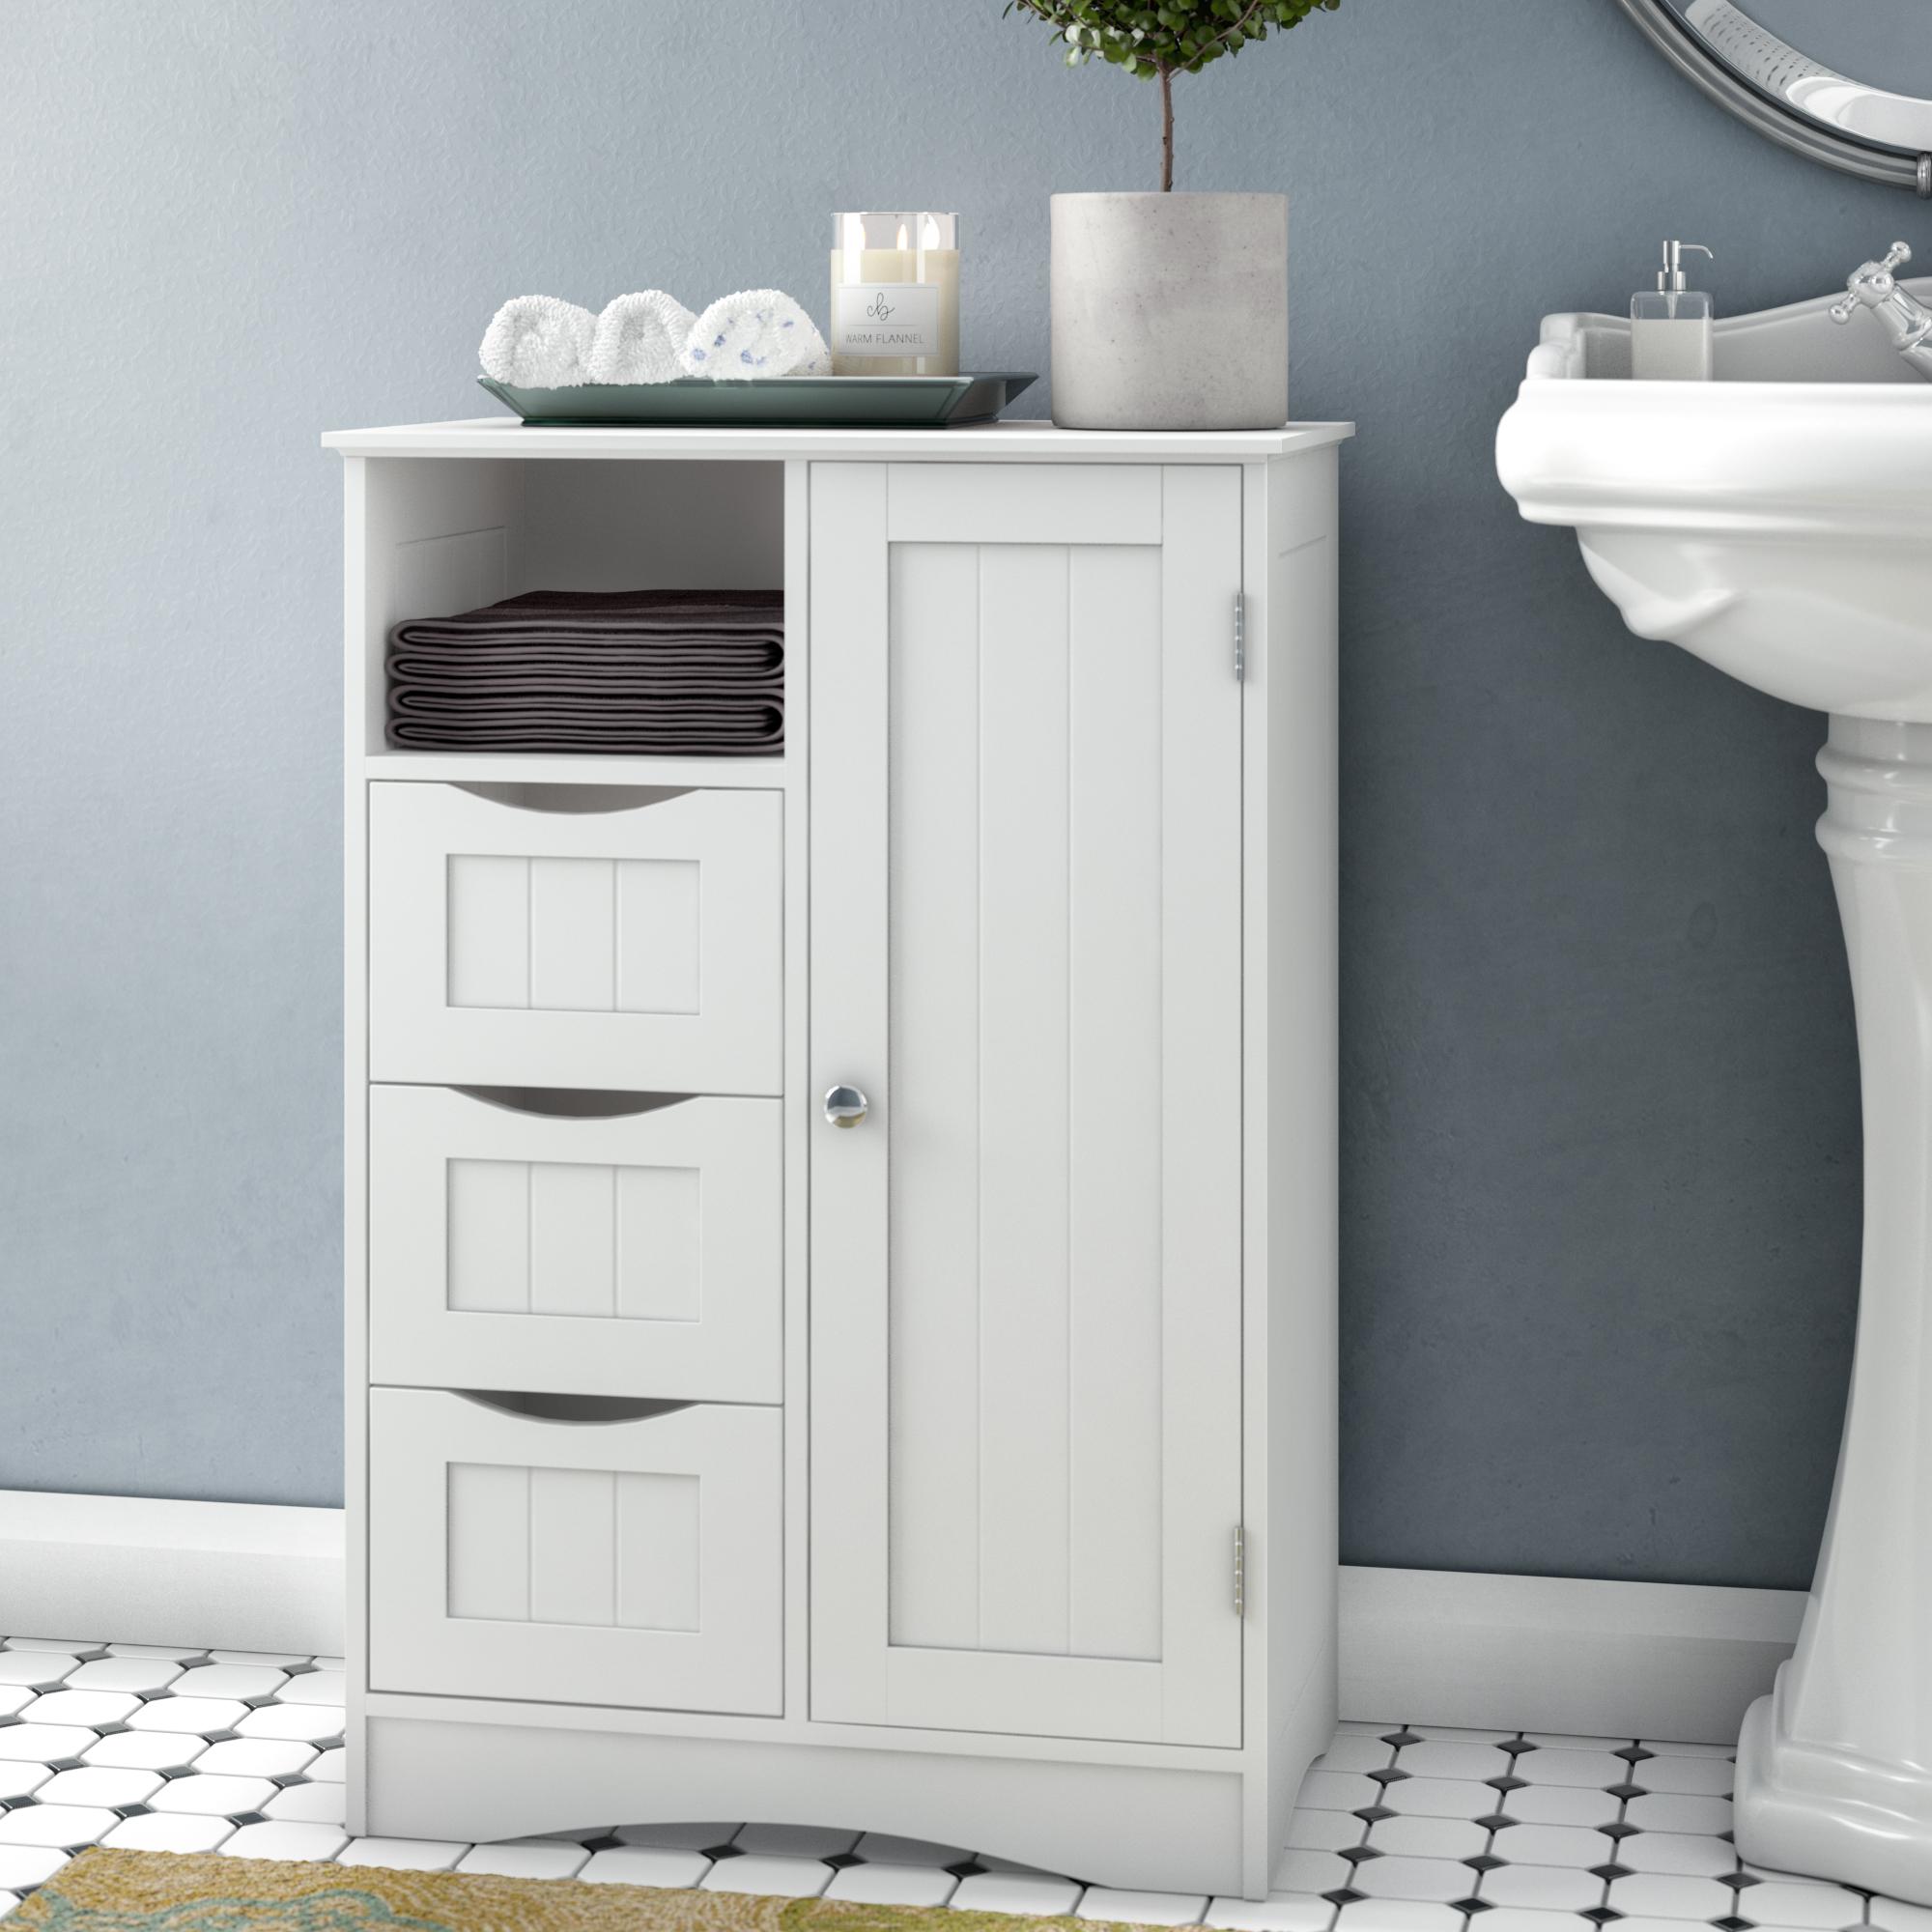 Bathroom Cabinets & Shelves | Birch Lane